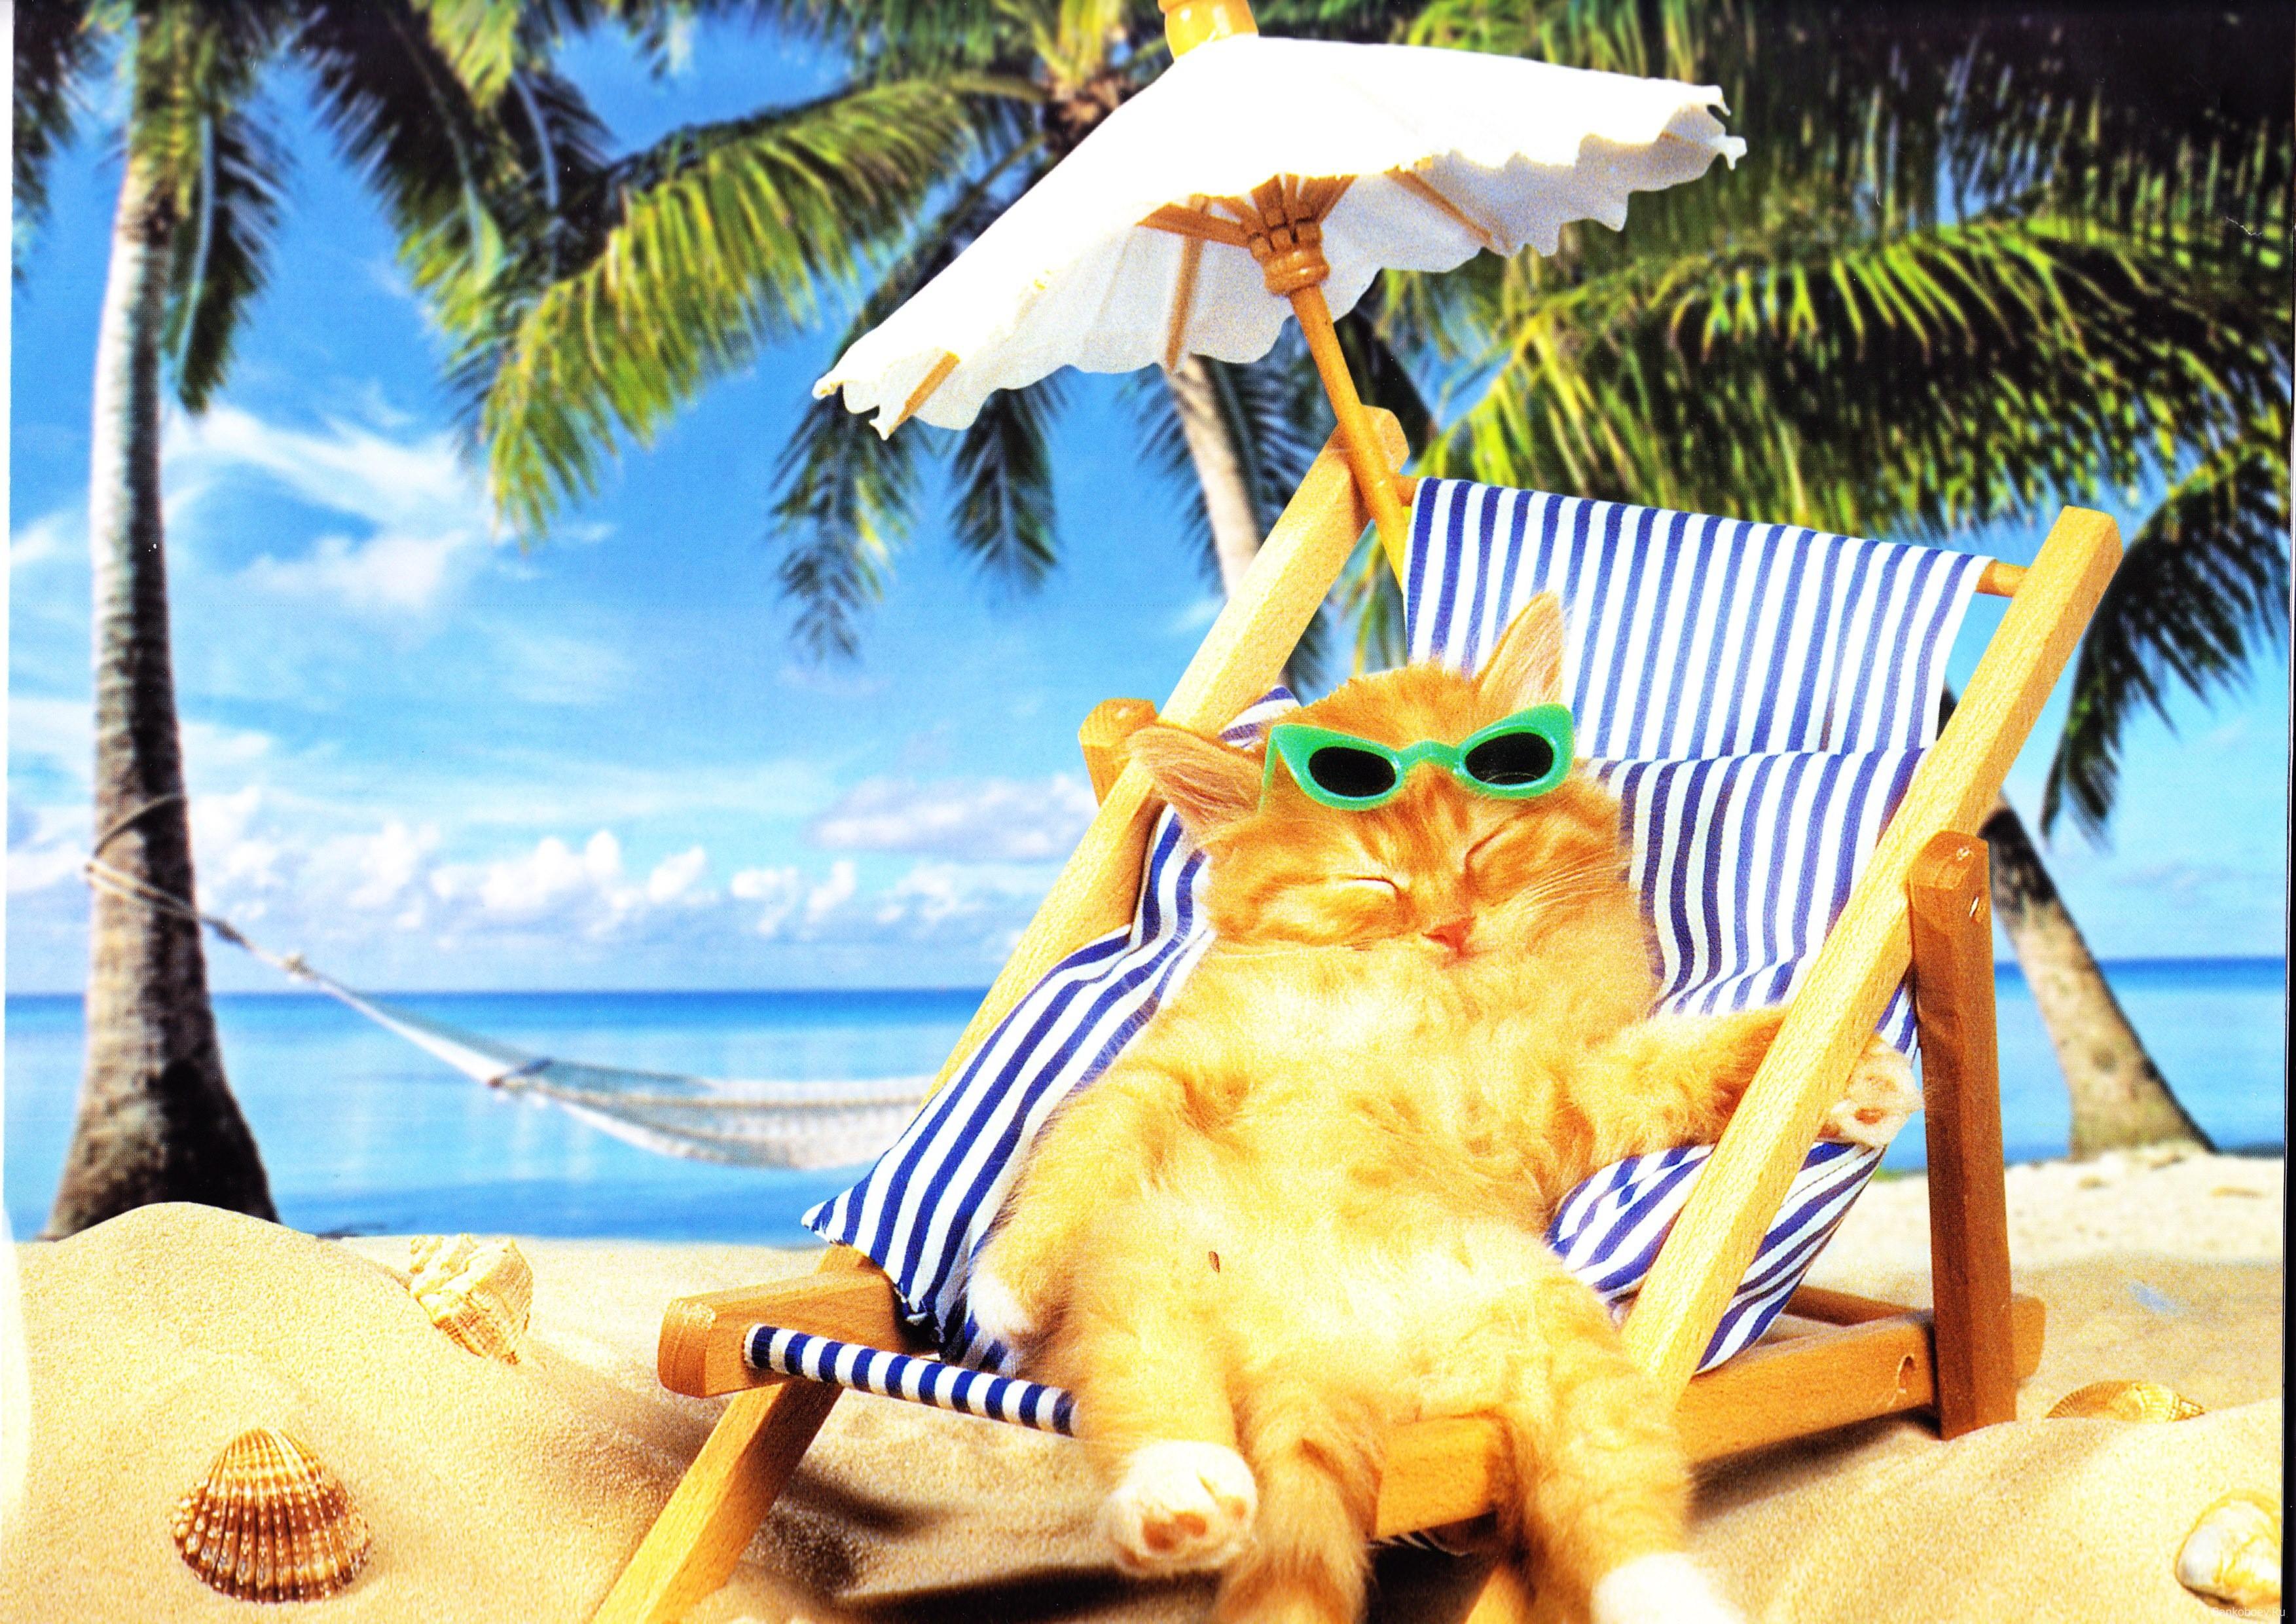 Смешные картинки об отпуске на море, города волге выпускнику